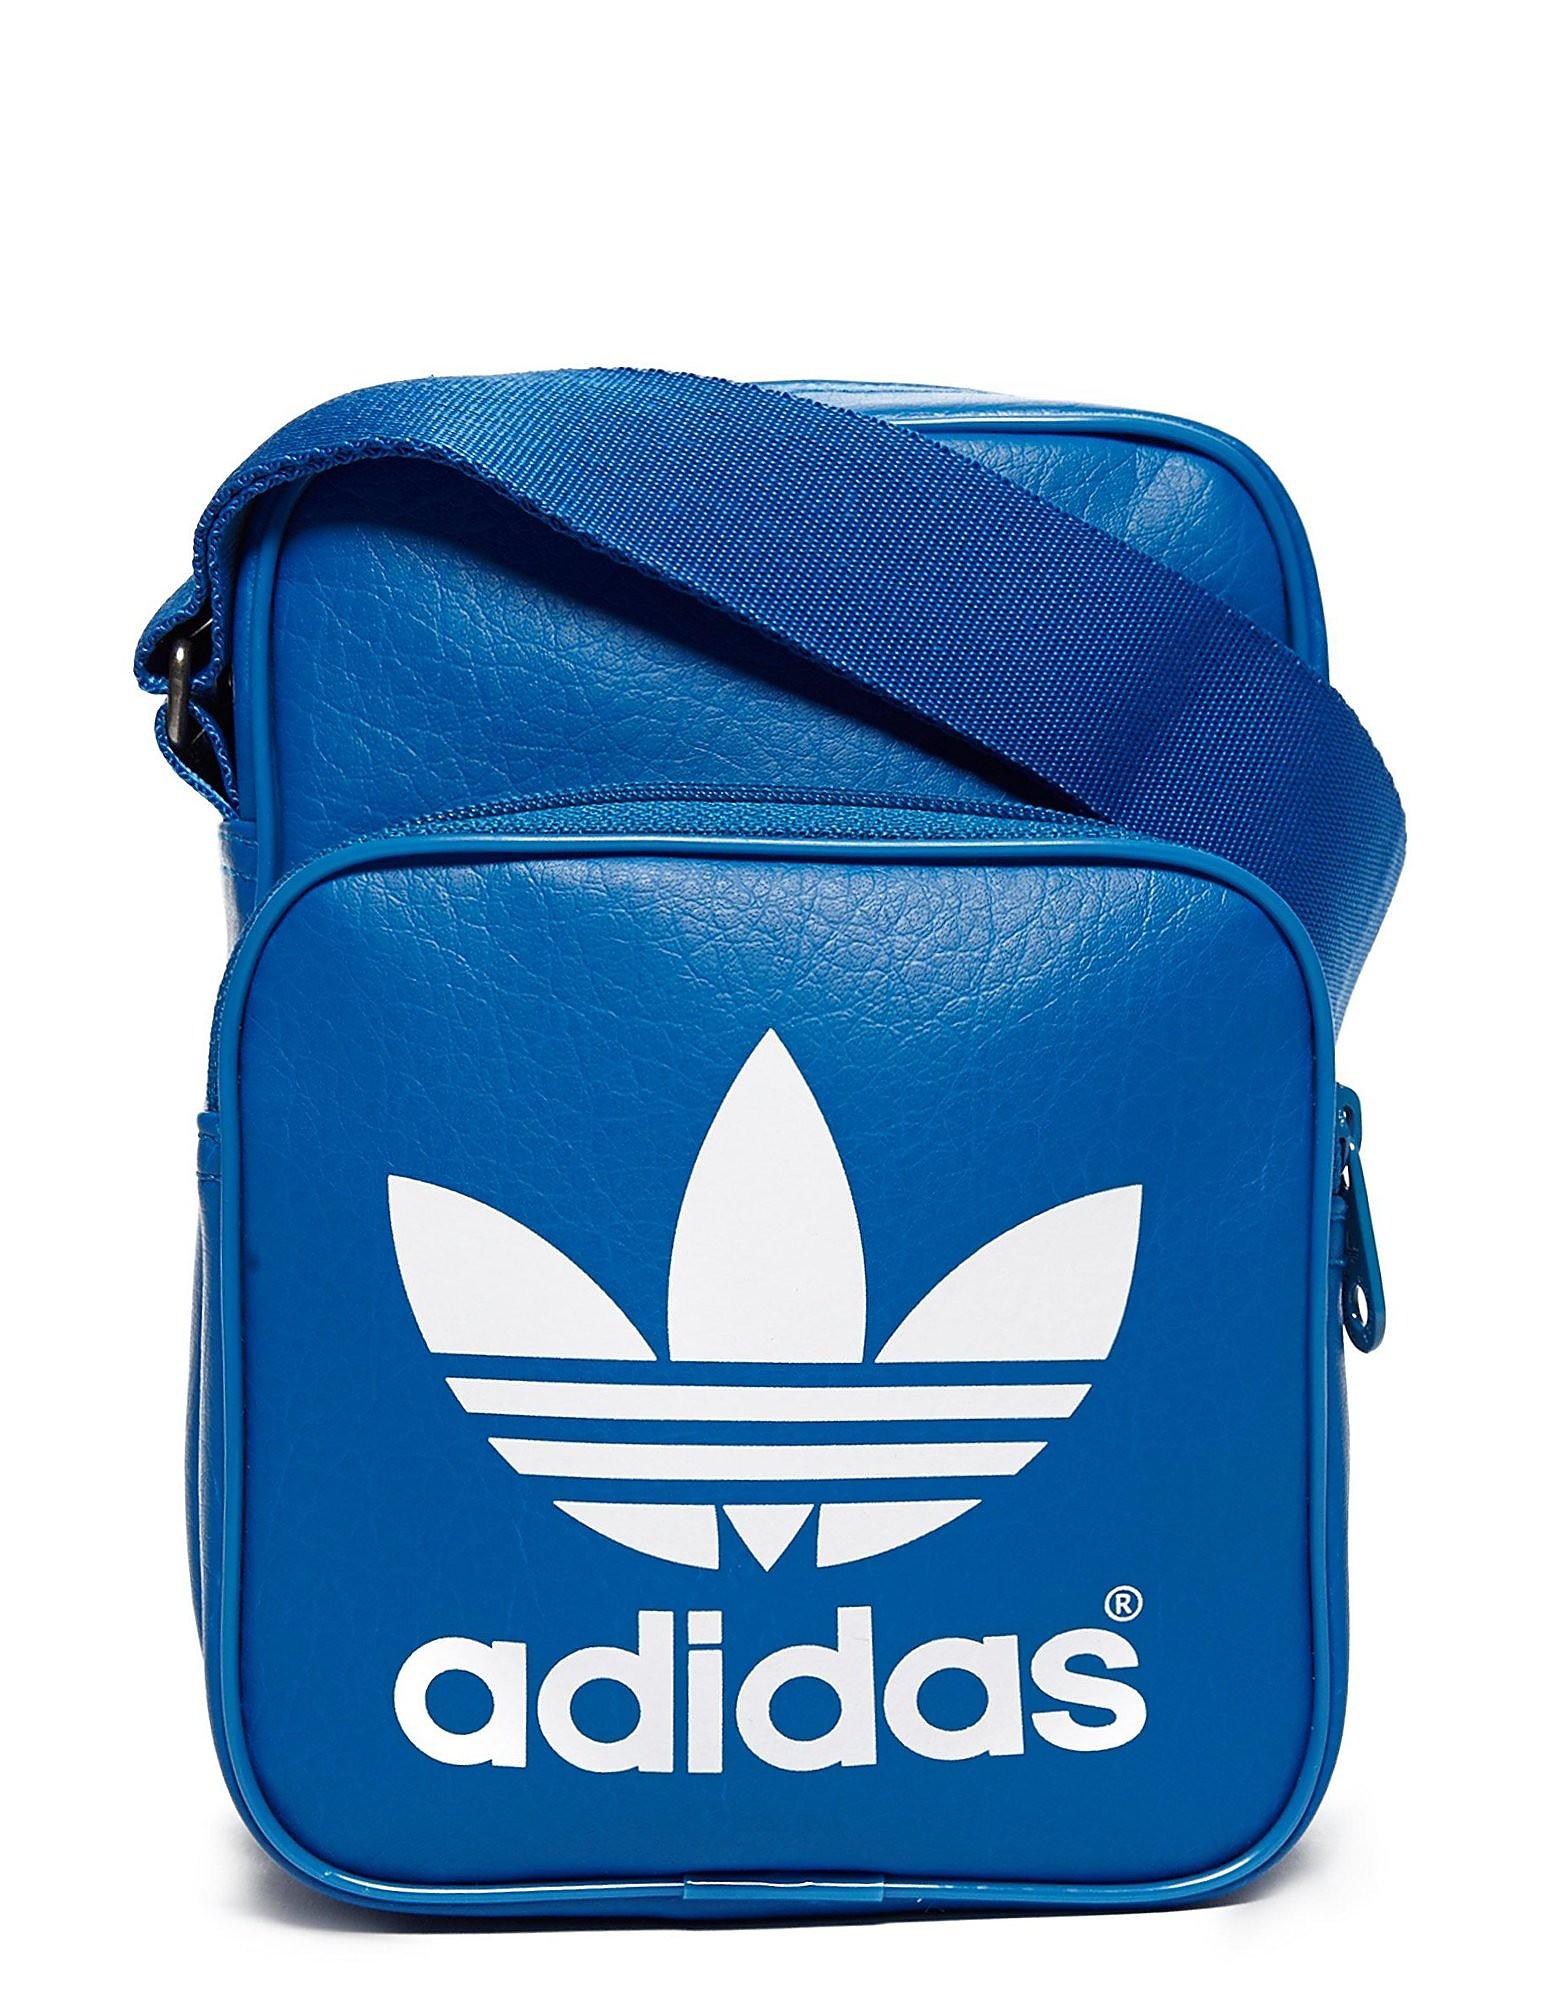 adidas Originals Mini Classic Small Items Bag - Bluebird - Mens, Bluebird